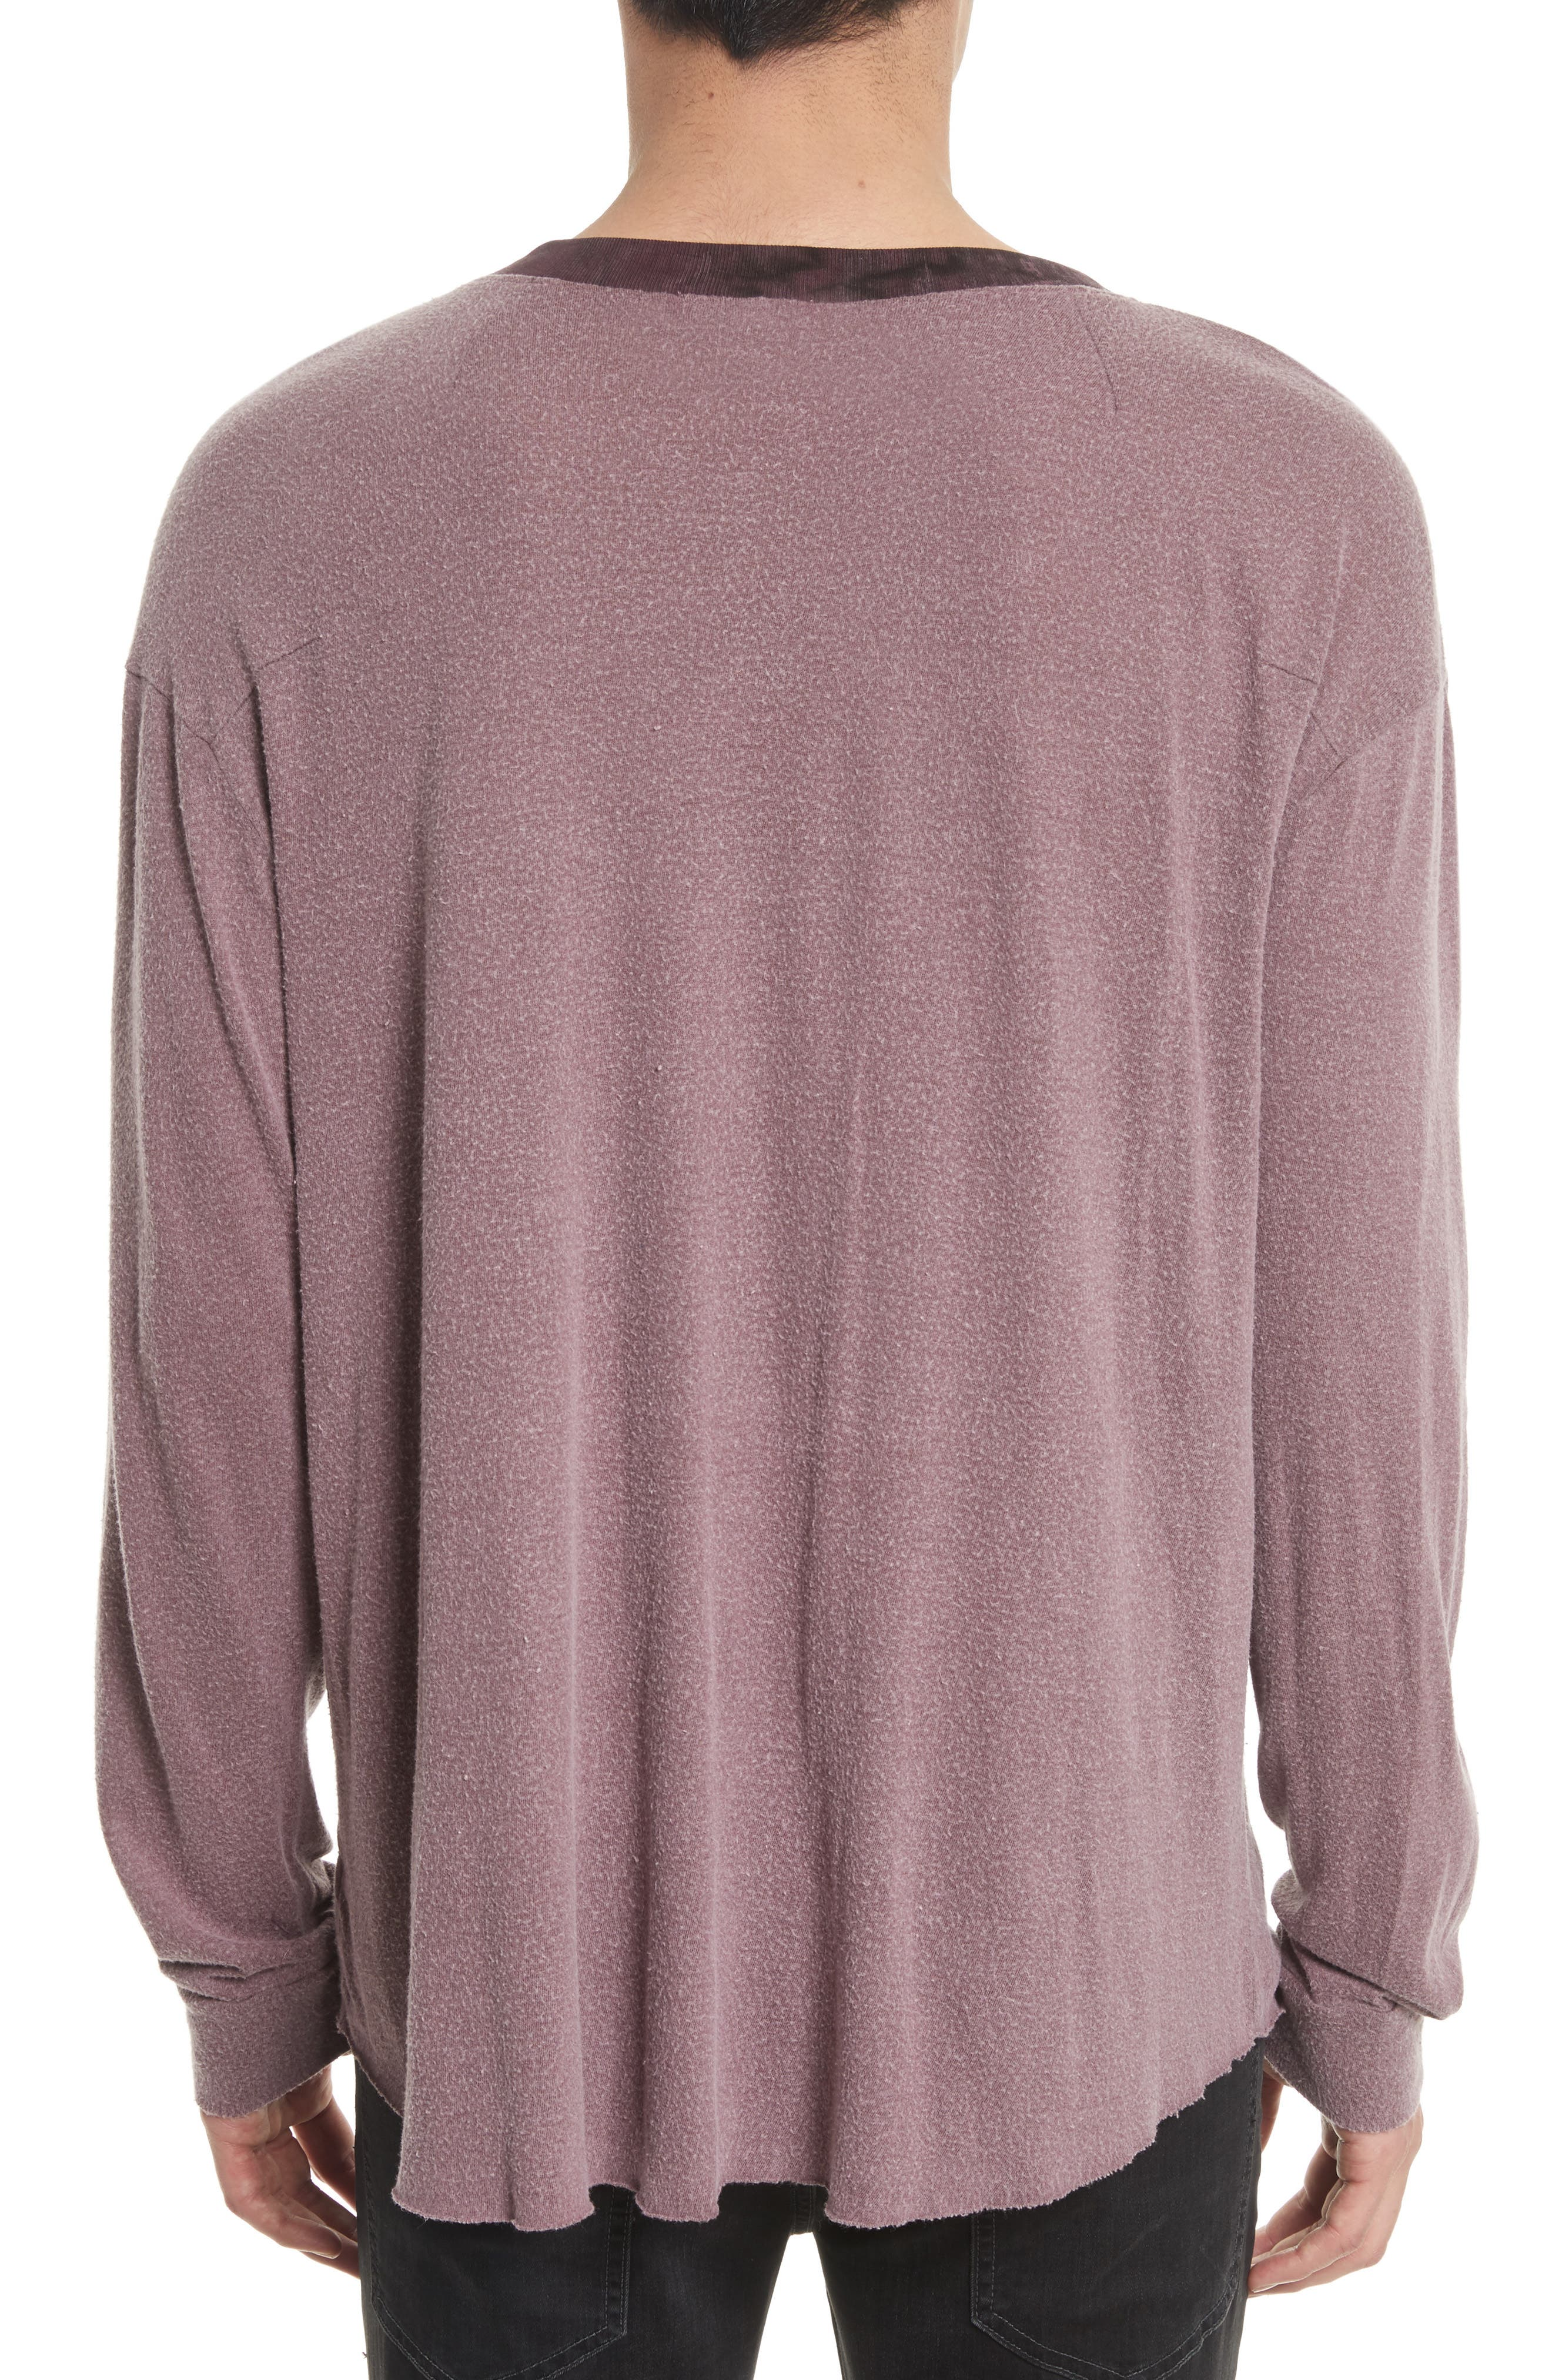 Tide Long Sleeve Pocket T-Shirt,                             Alternate thumbnail 2, color,                             649